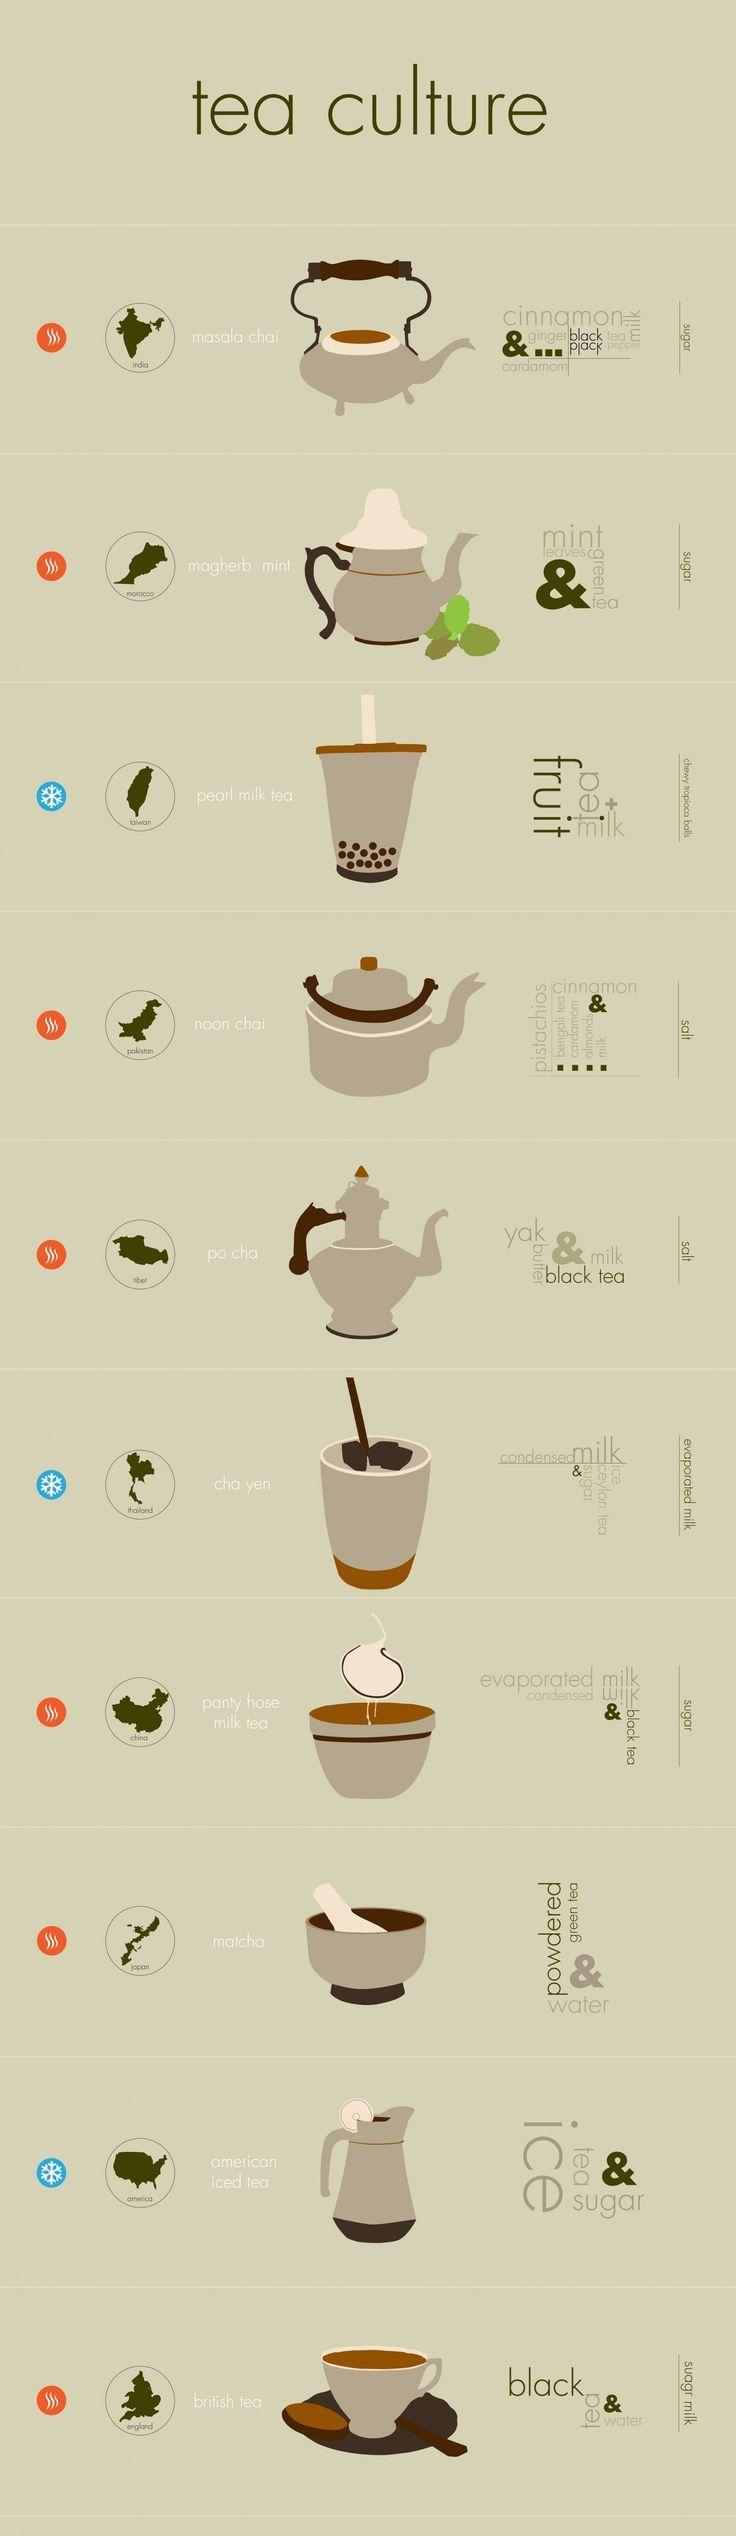 Tea Culture Infographic: India, Morocco, Taiwan, Pakistan, Tibet, Thailand, China, Japan, United States, United Kingdom: